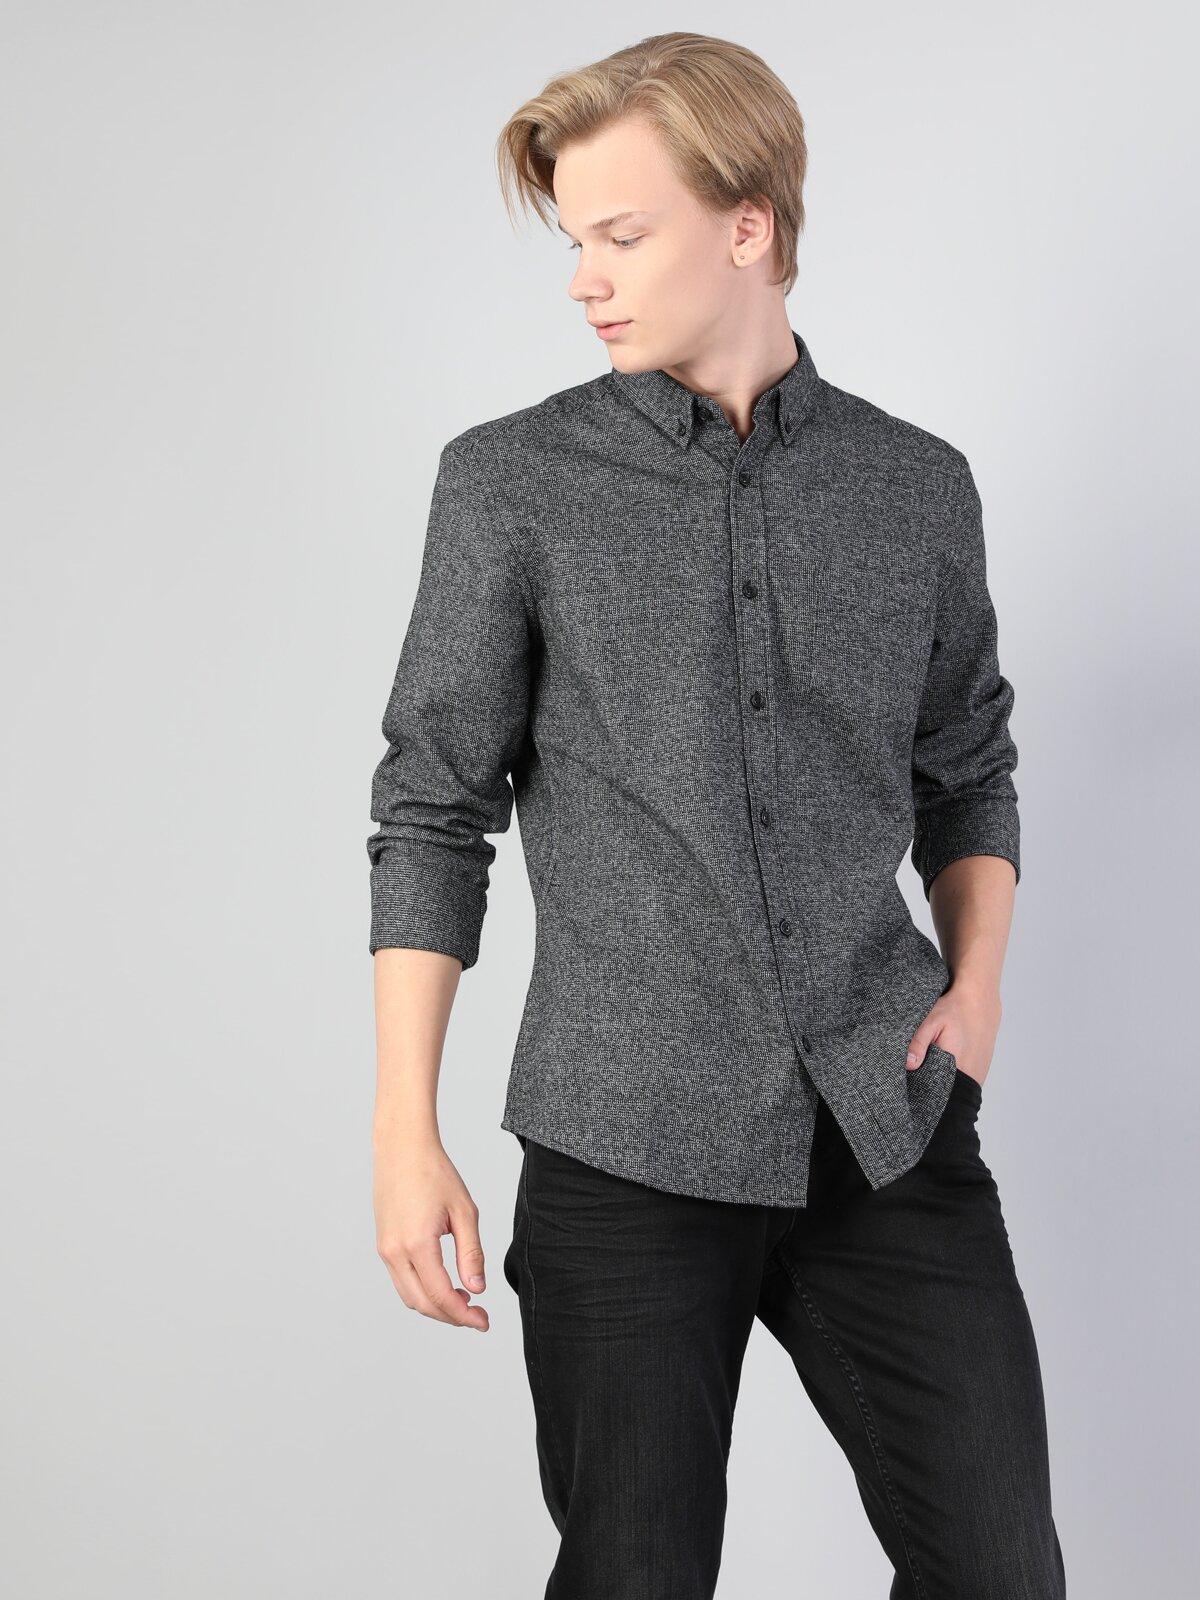 Slim Fit Shirt Neck Erkek Antrasit Uzun Kol Gömlek